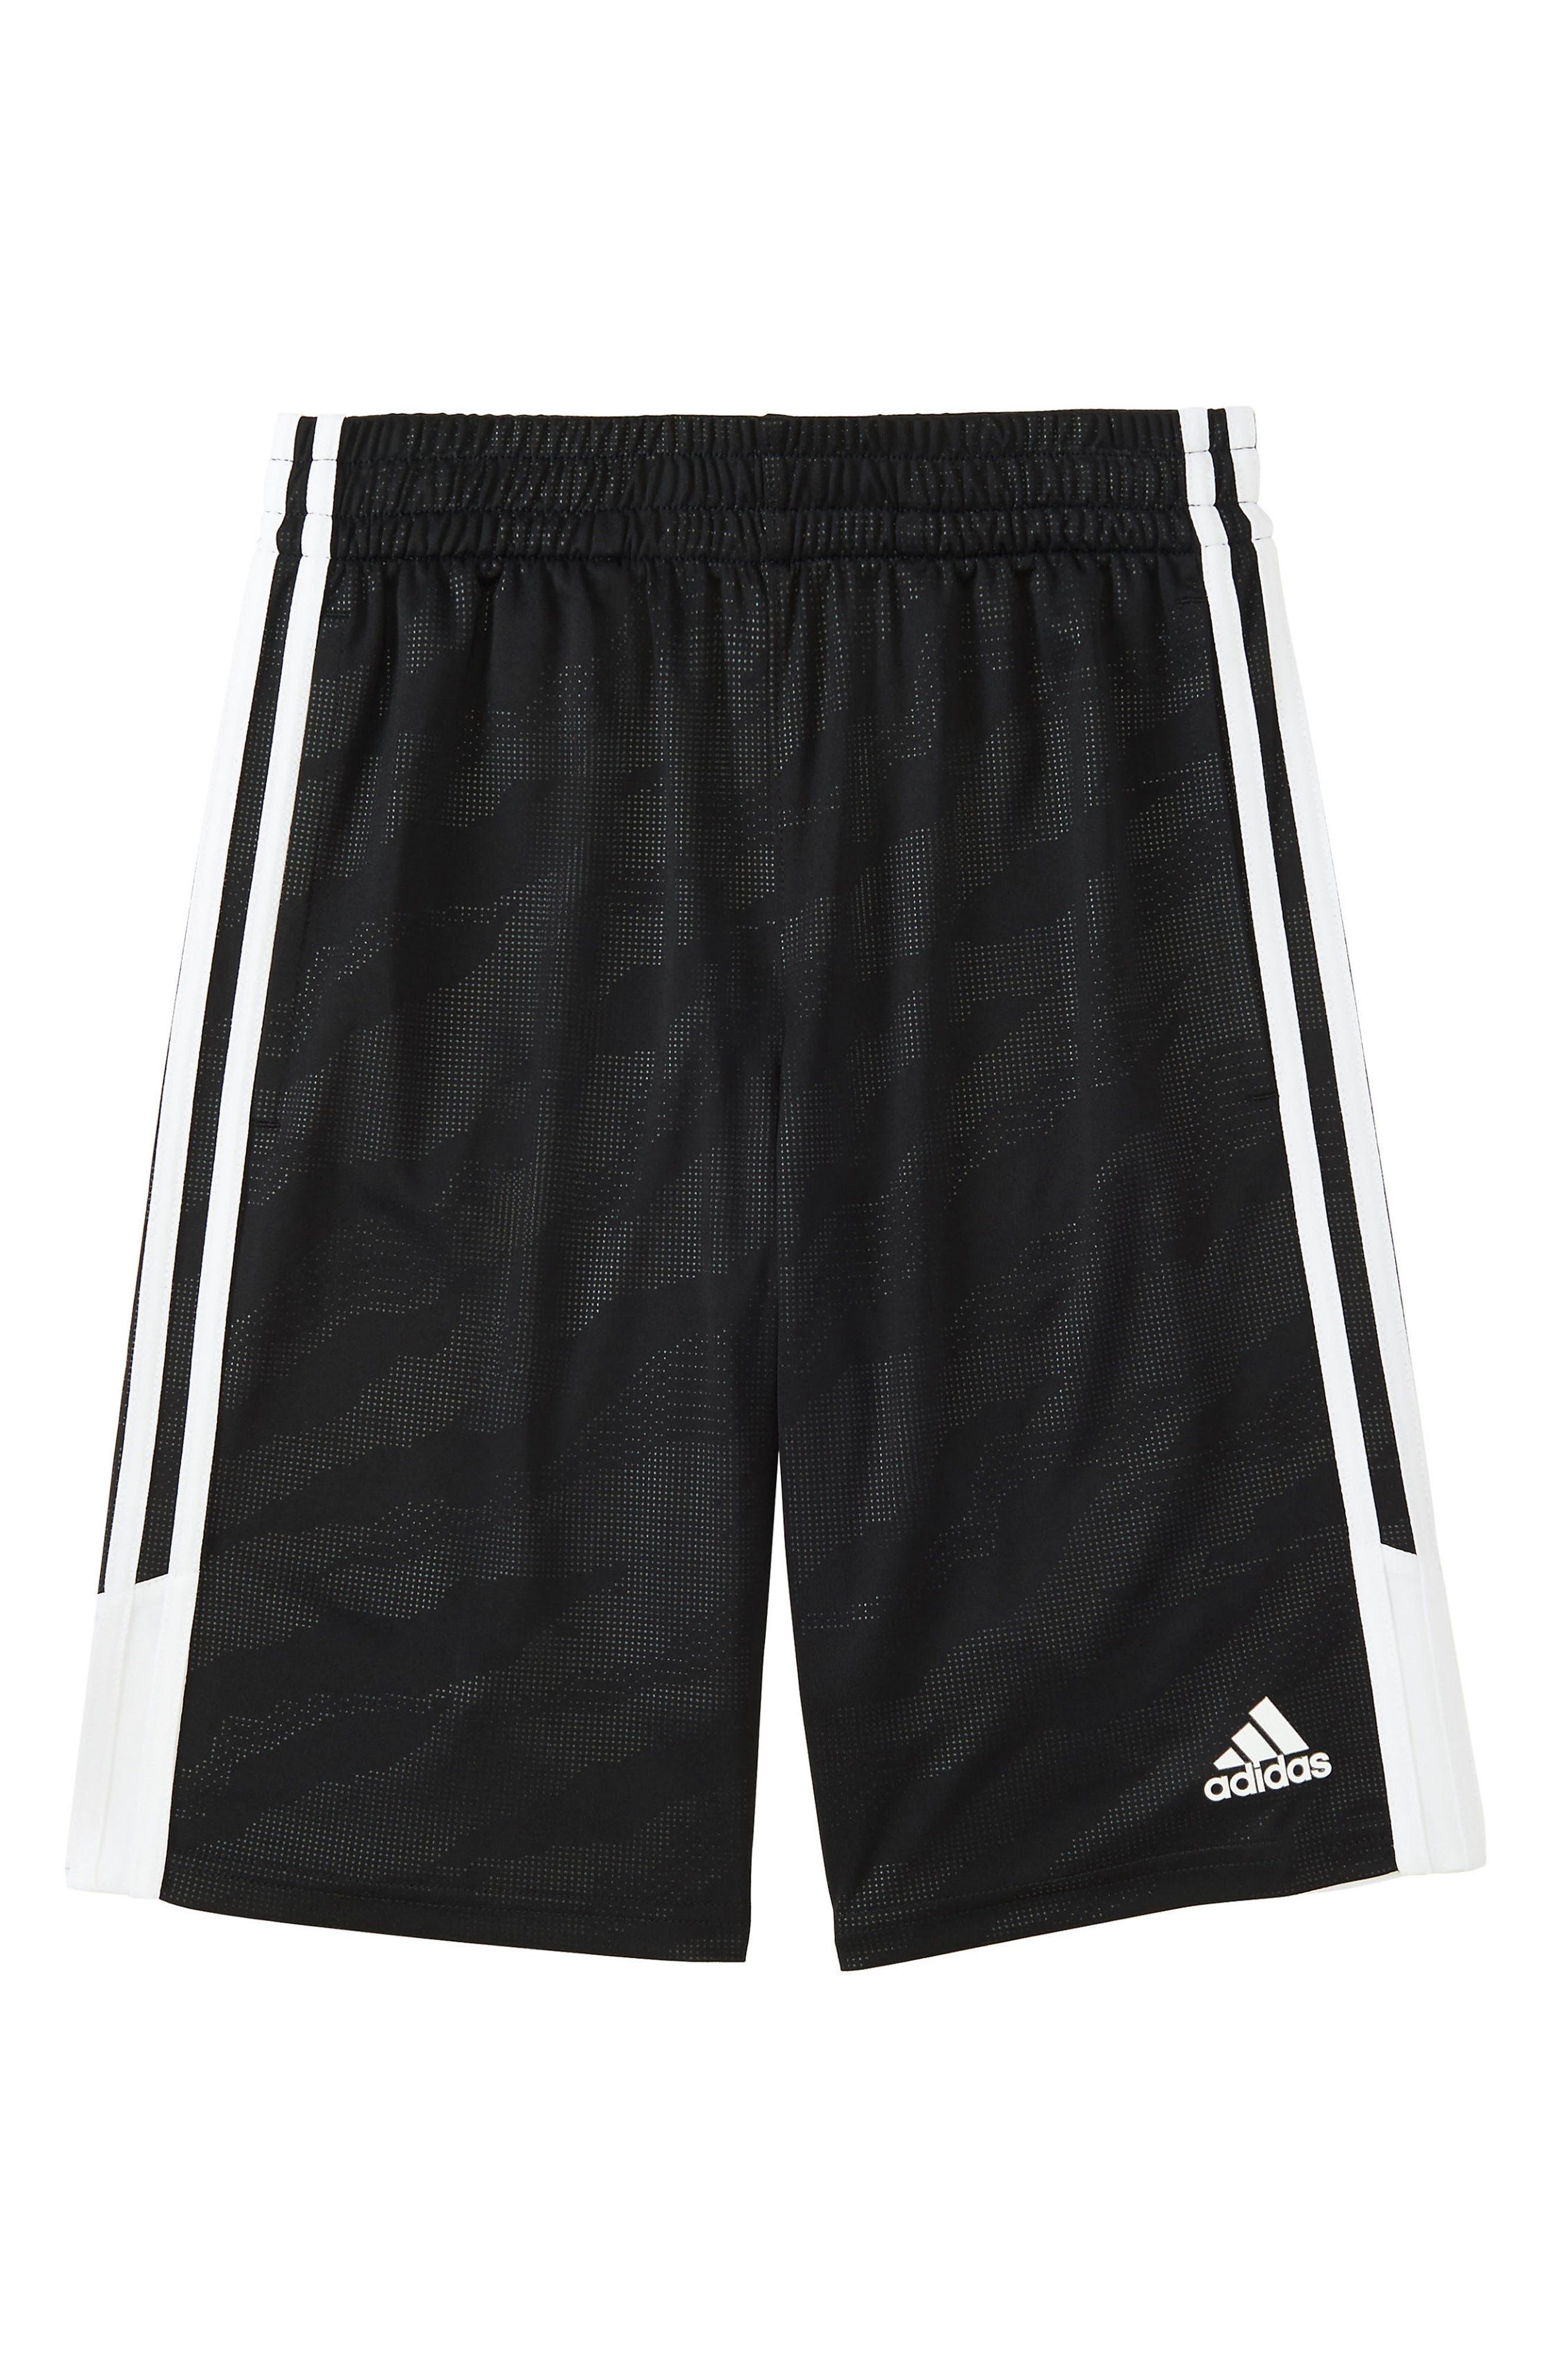 Camo Shorts,                         Main,                         color, BLACK